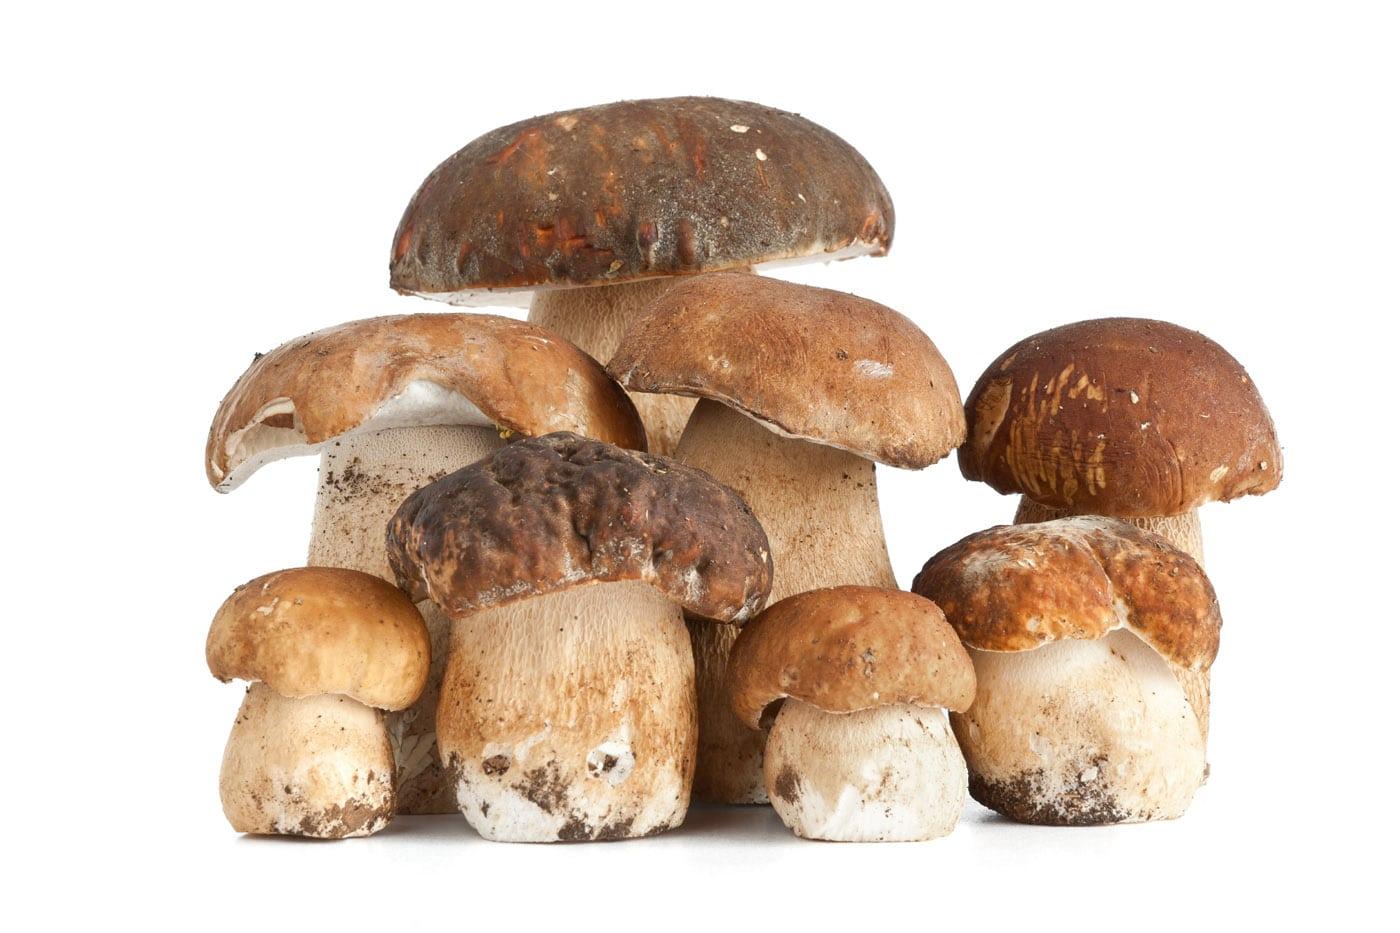 Dieta, i funghi aiutano a dimagrire e rafforzano le difese immunitarie!